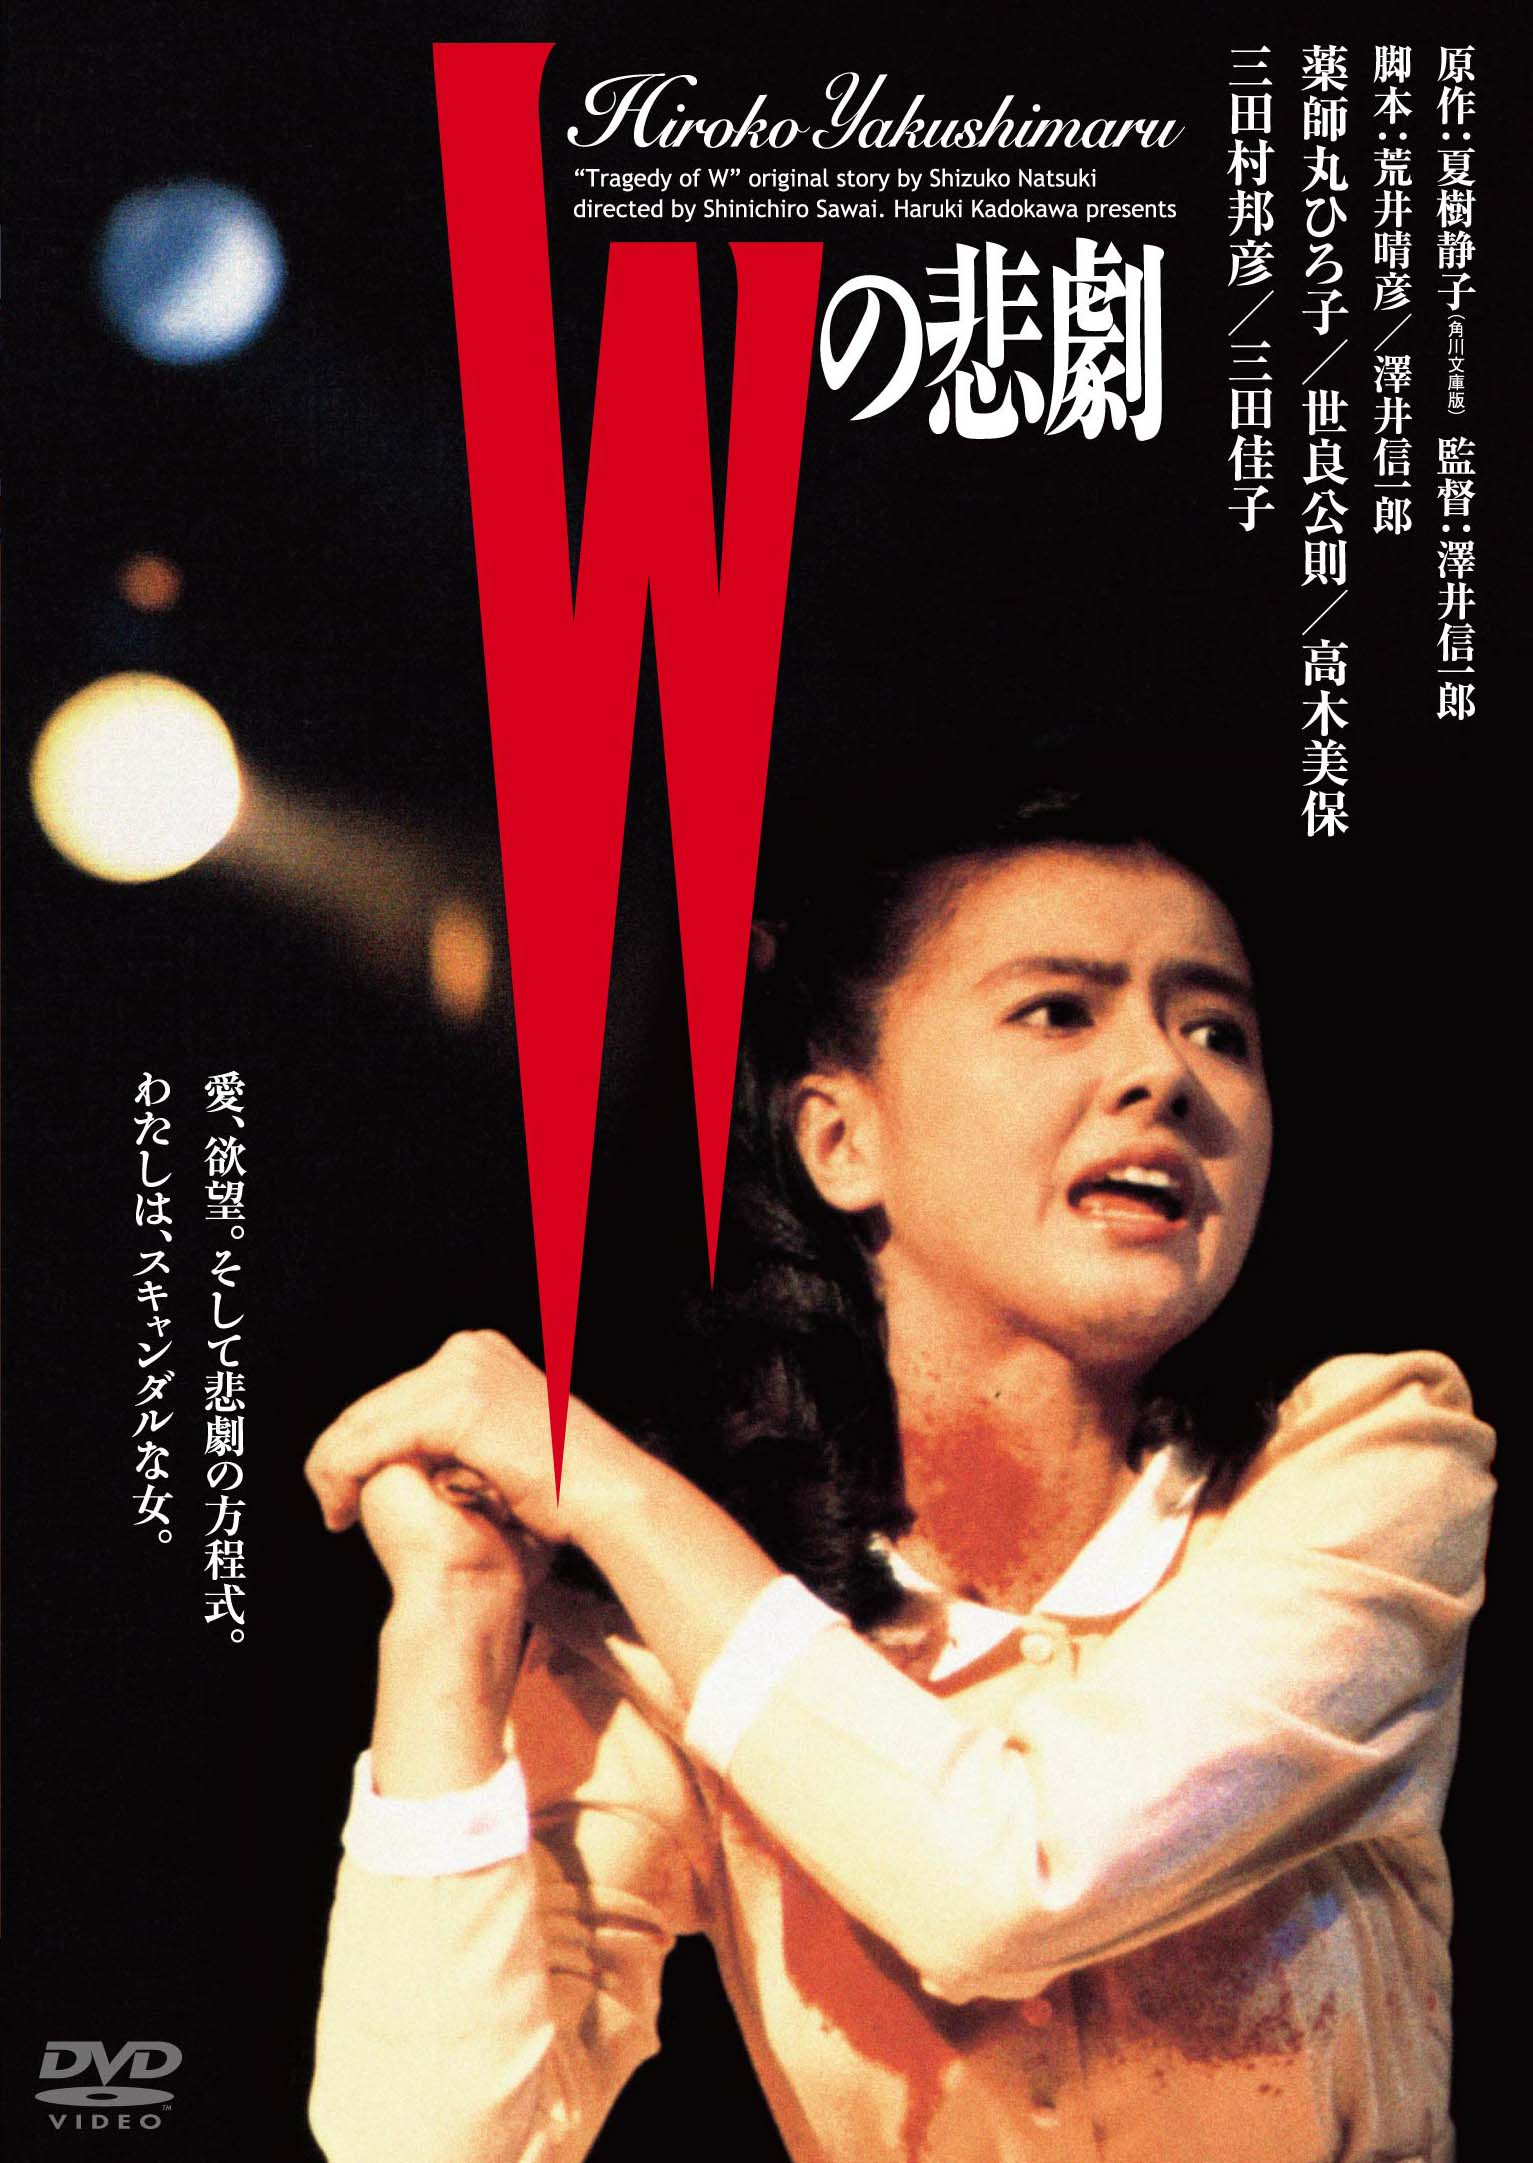 Wの悲劇 |CINEMORE(シネモア)